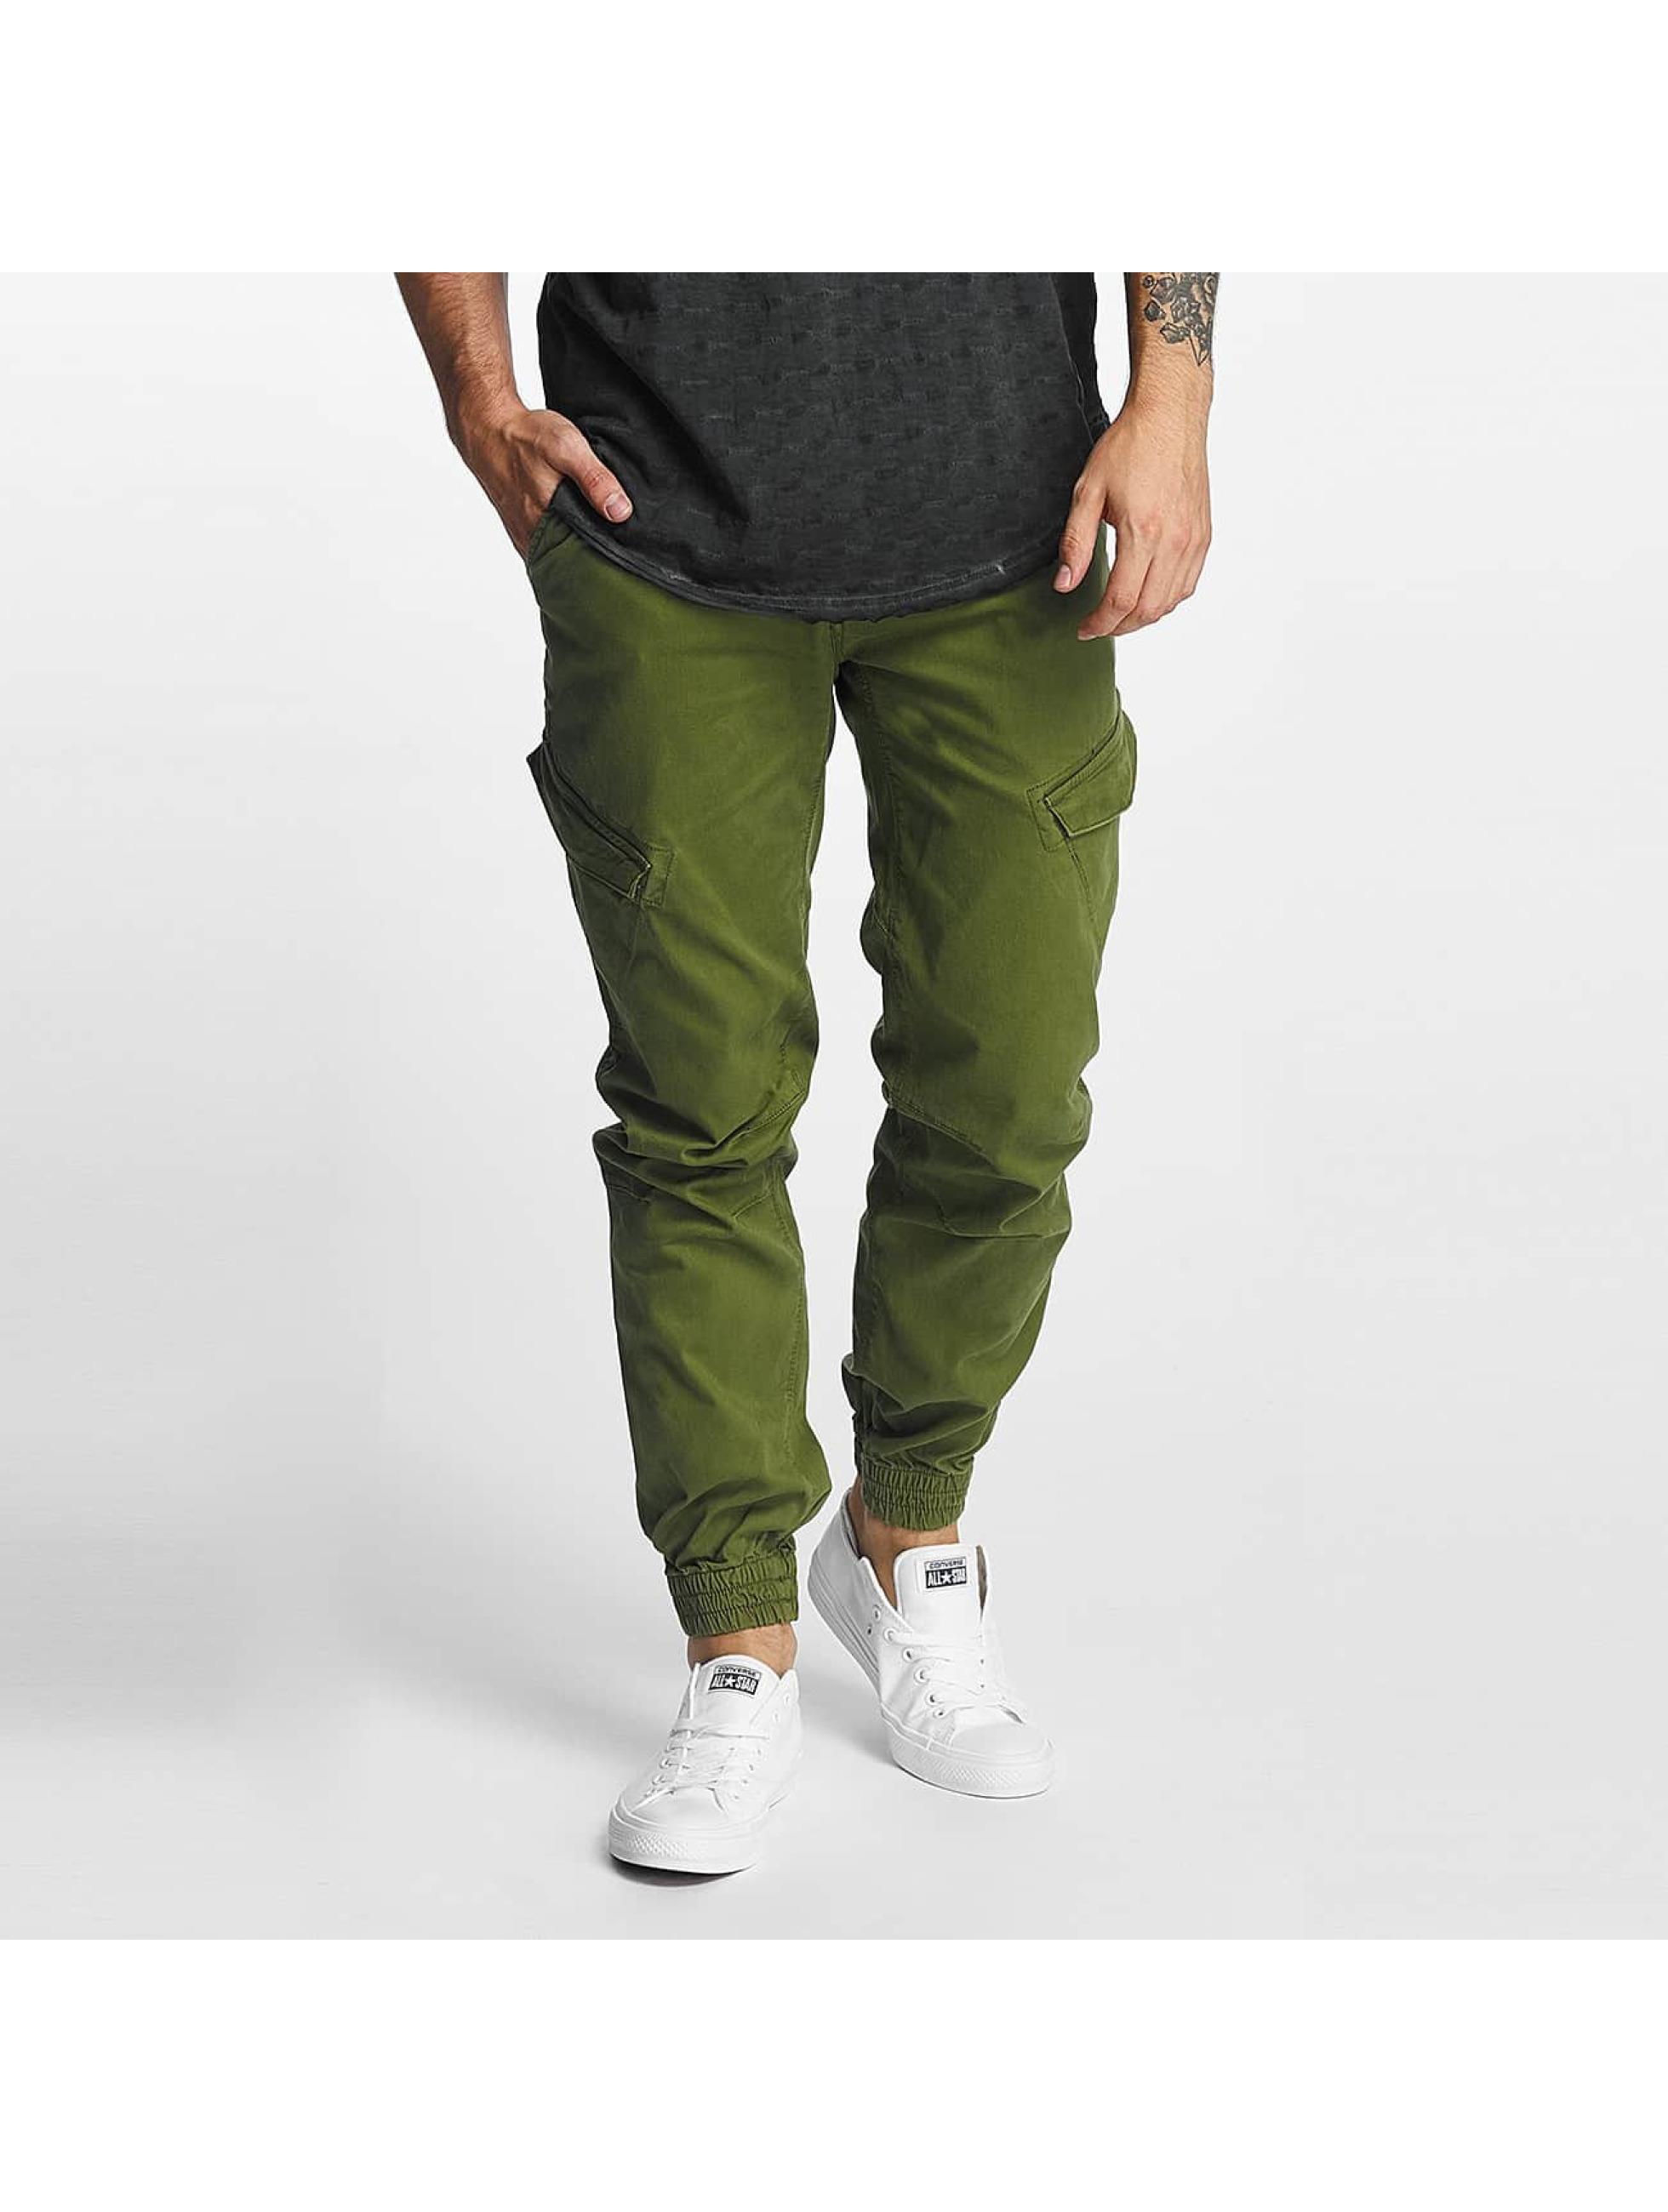 SHINE Original Chino bukser Slim grøn